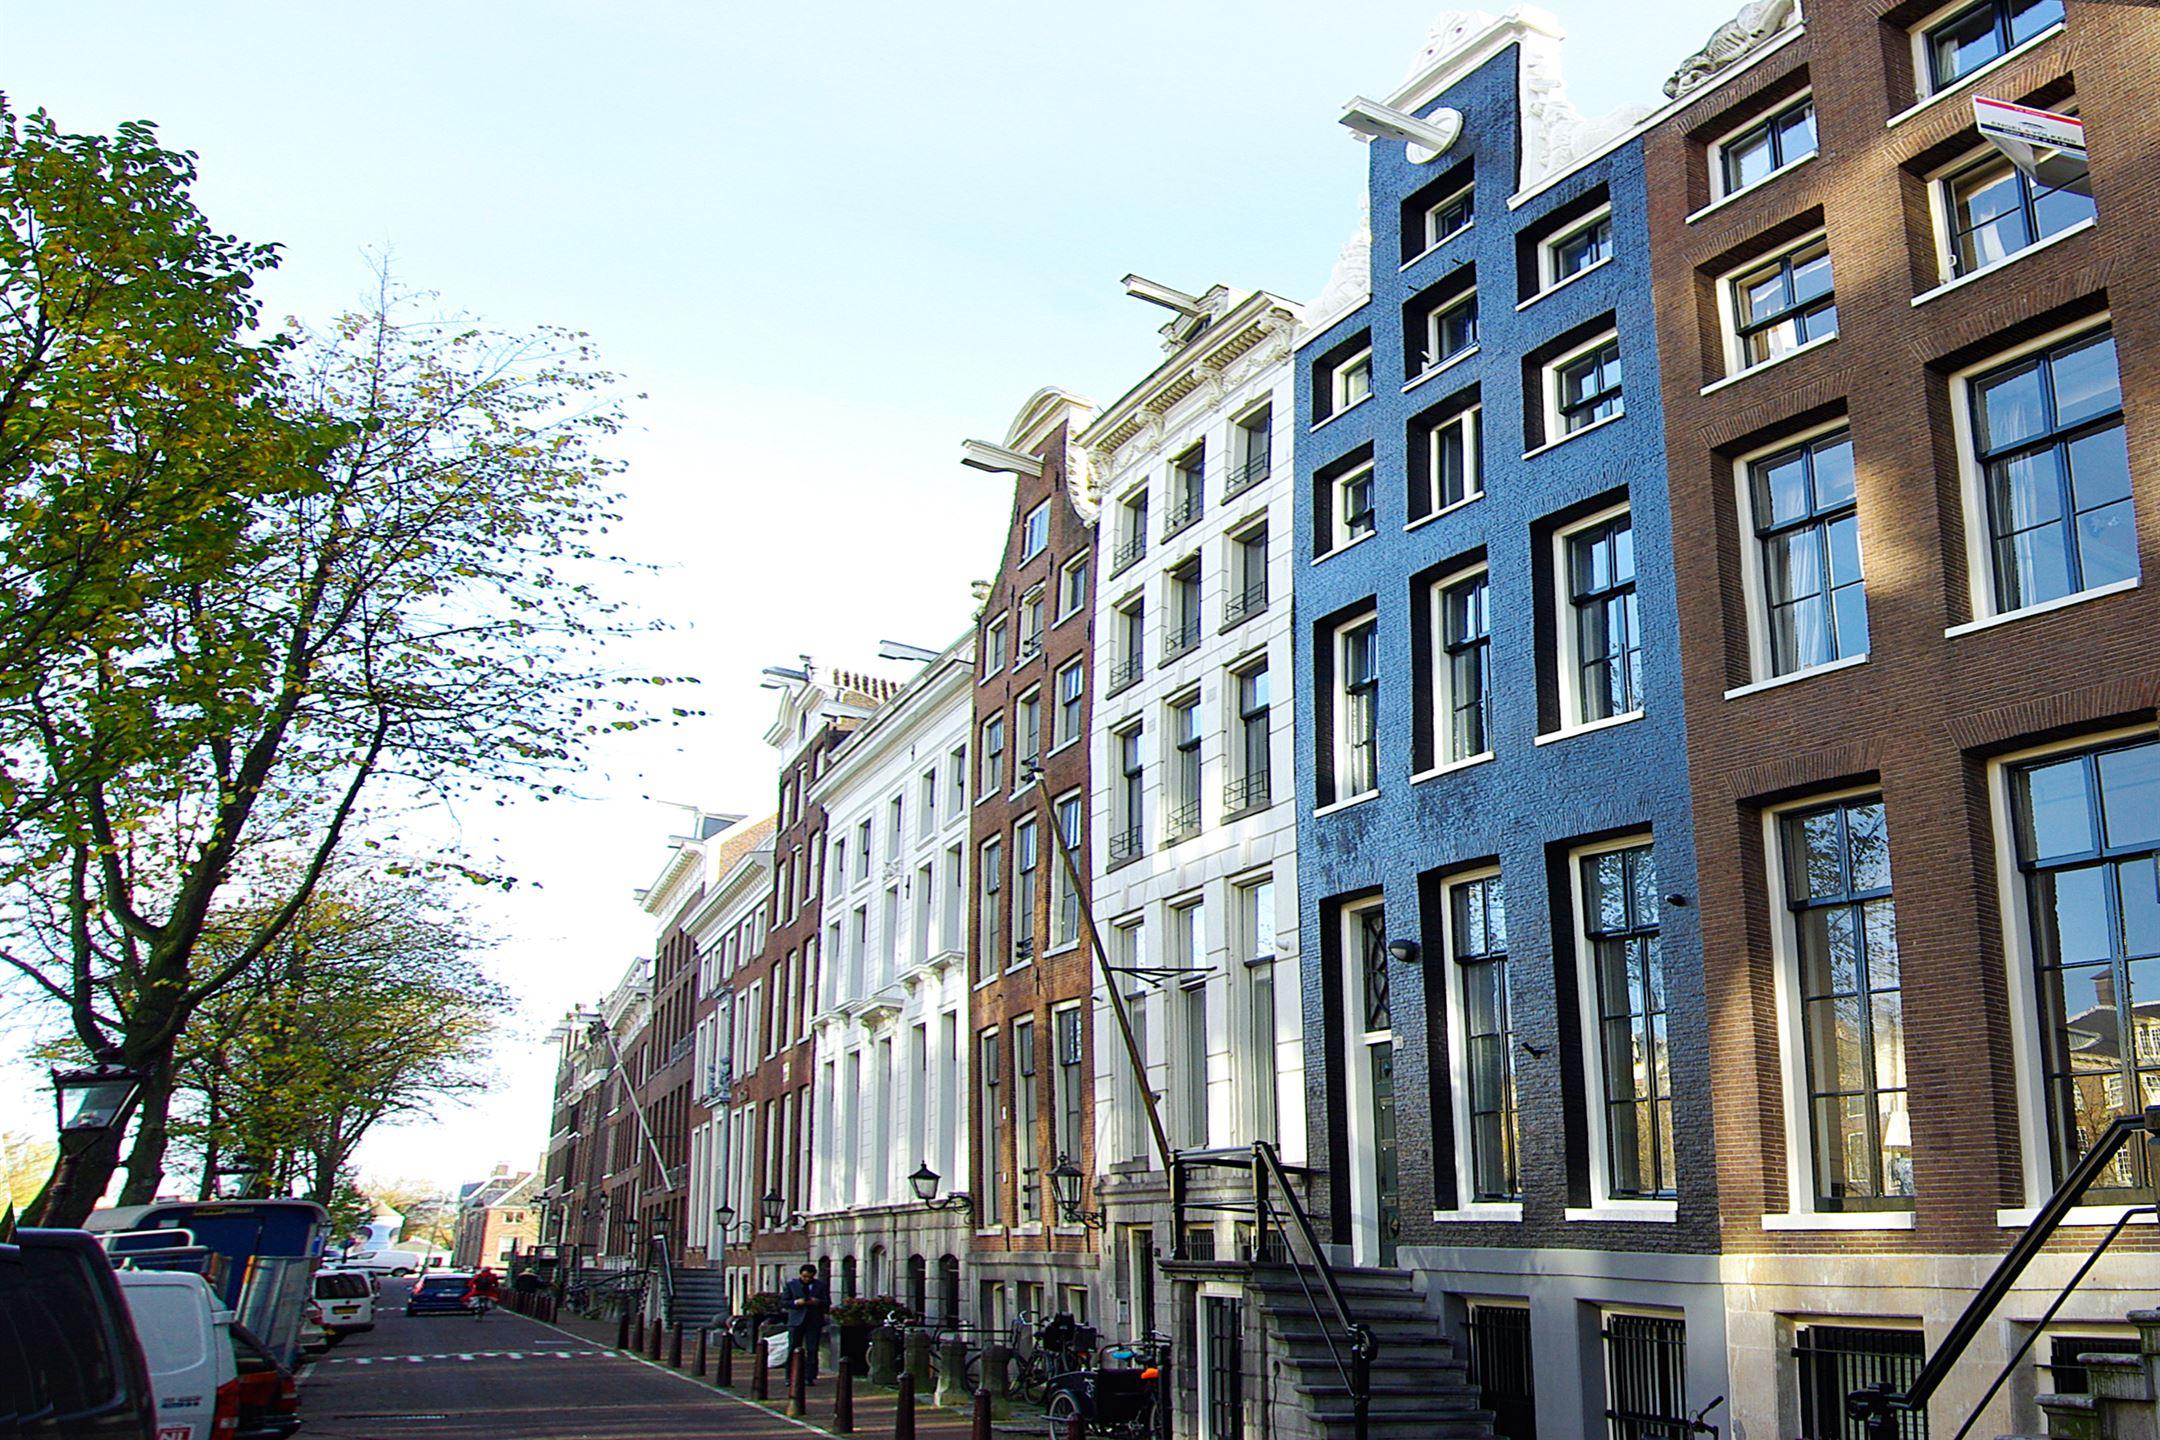 Verhuurd herengracht 570 c 1017 ch amsterdam funda for Herengracht amsterdam